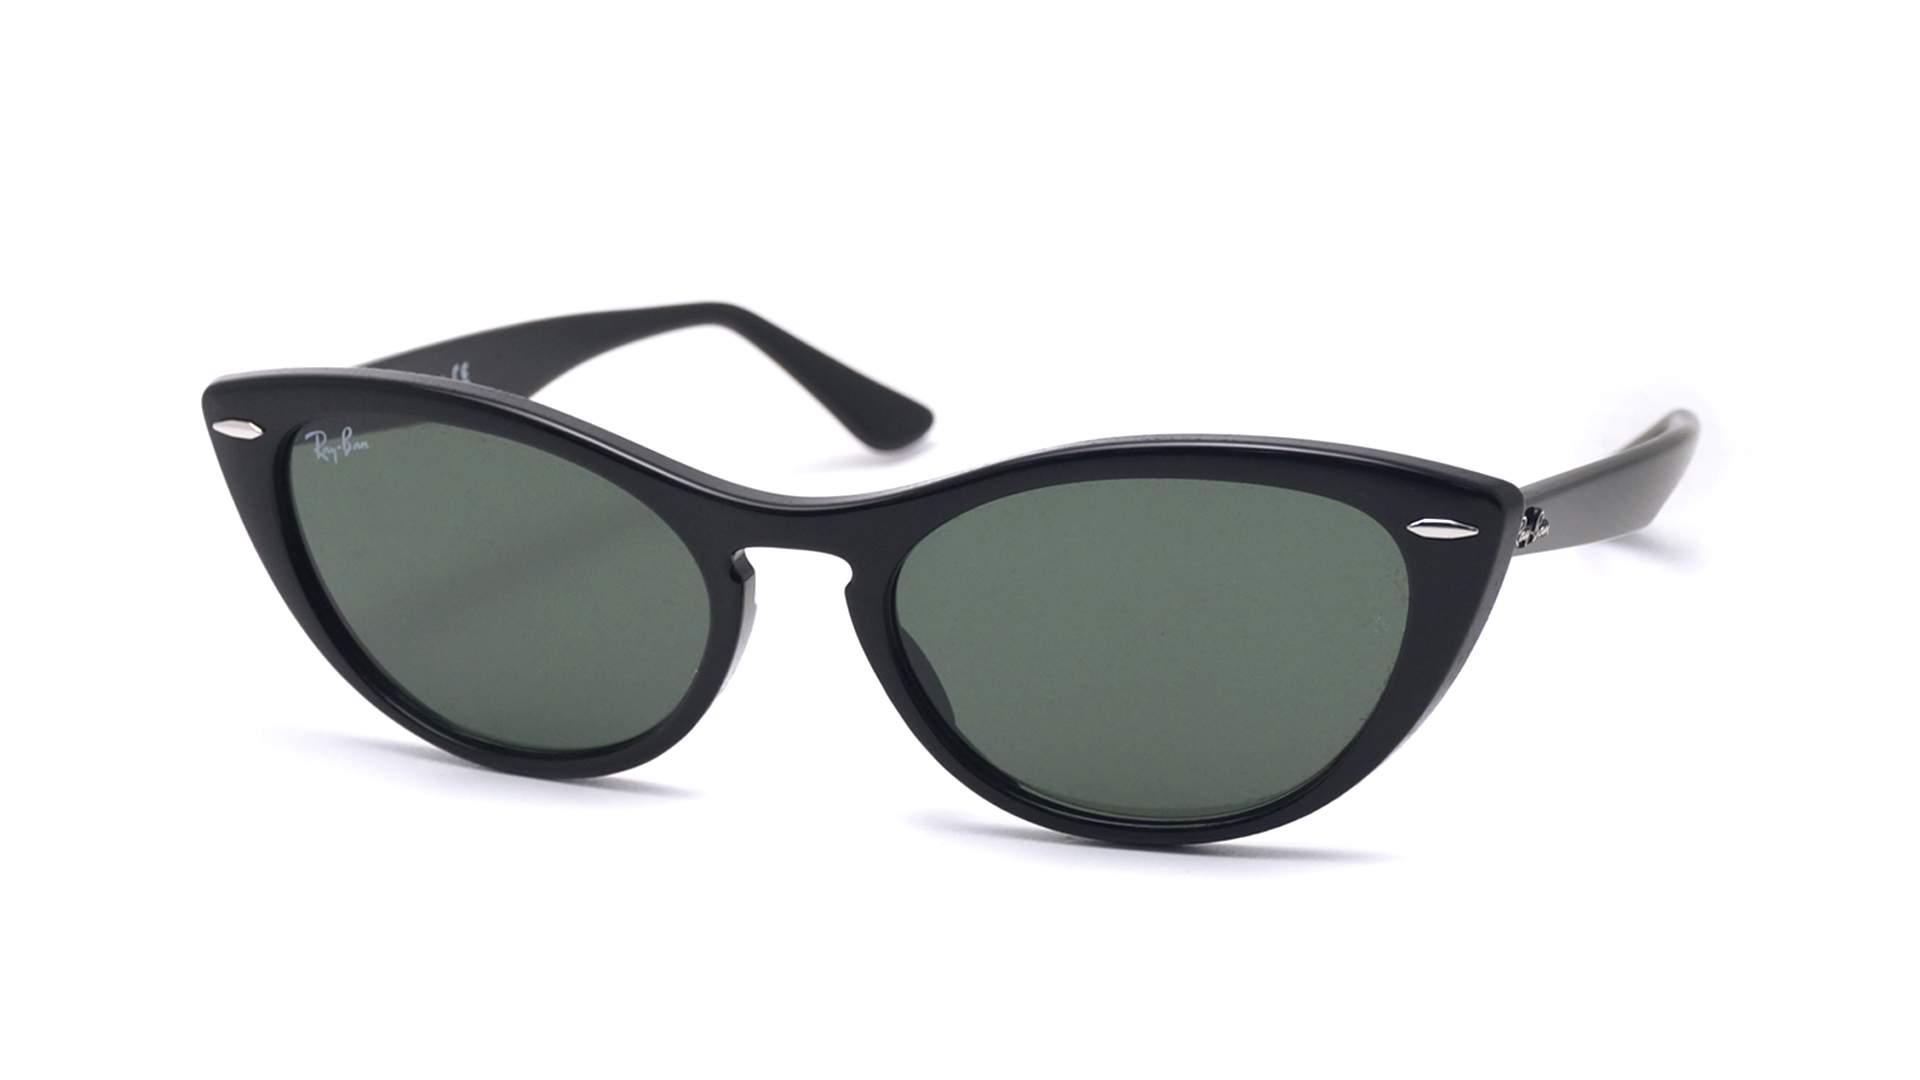 f79666c202 Sunglasses Ray-Ban Nina Black RB4314N 601 31 54-18 Medium